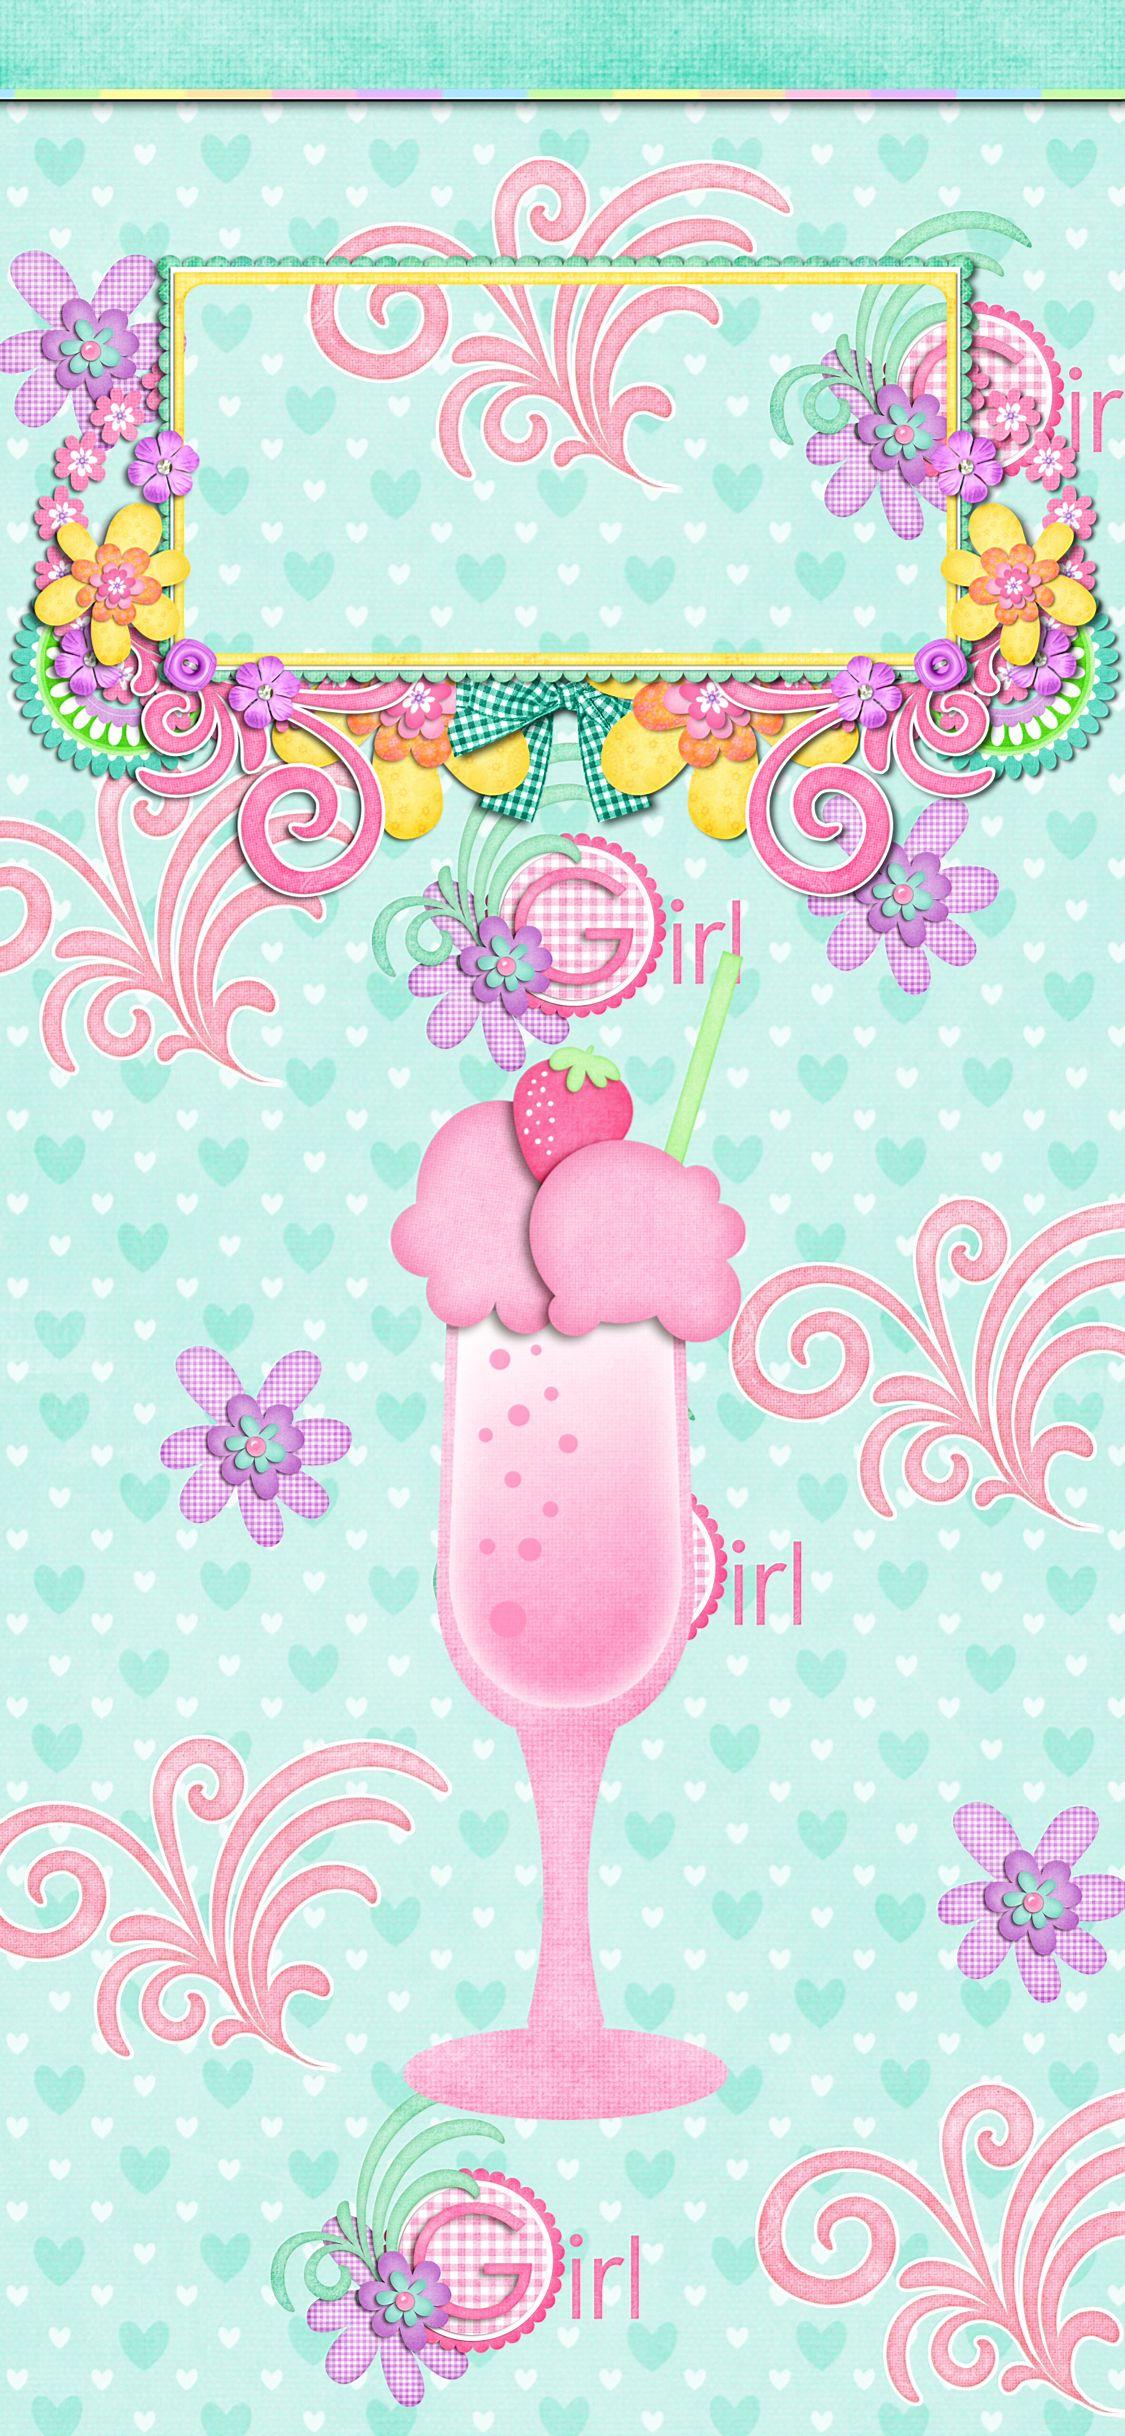 Iphone X Version Cute Wallpapers Iphone Wallpaper Spring Wallpaper